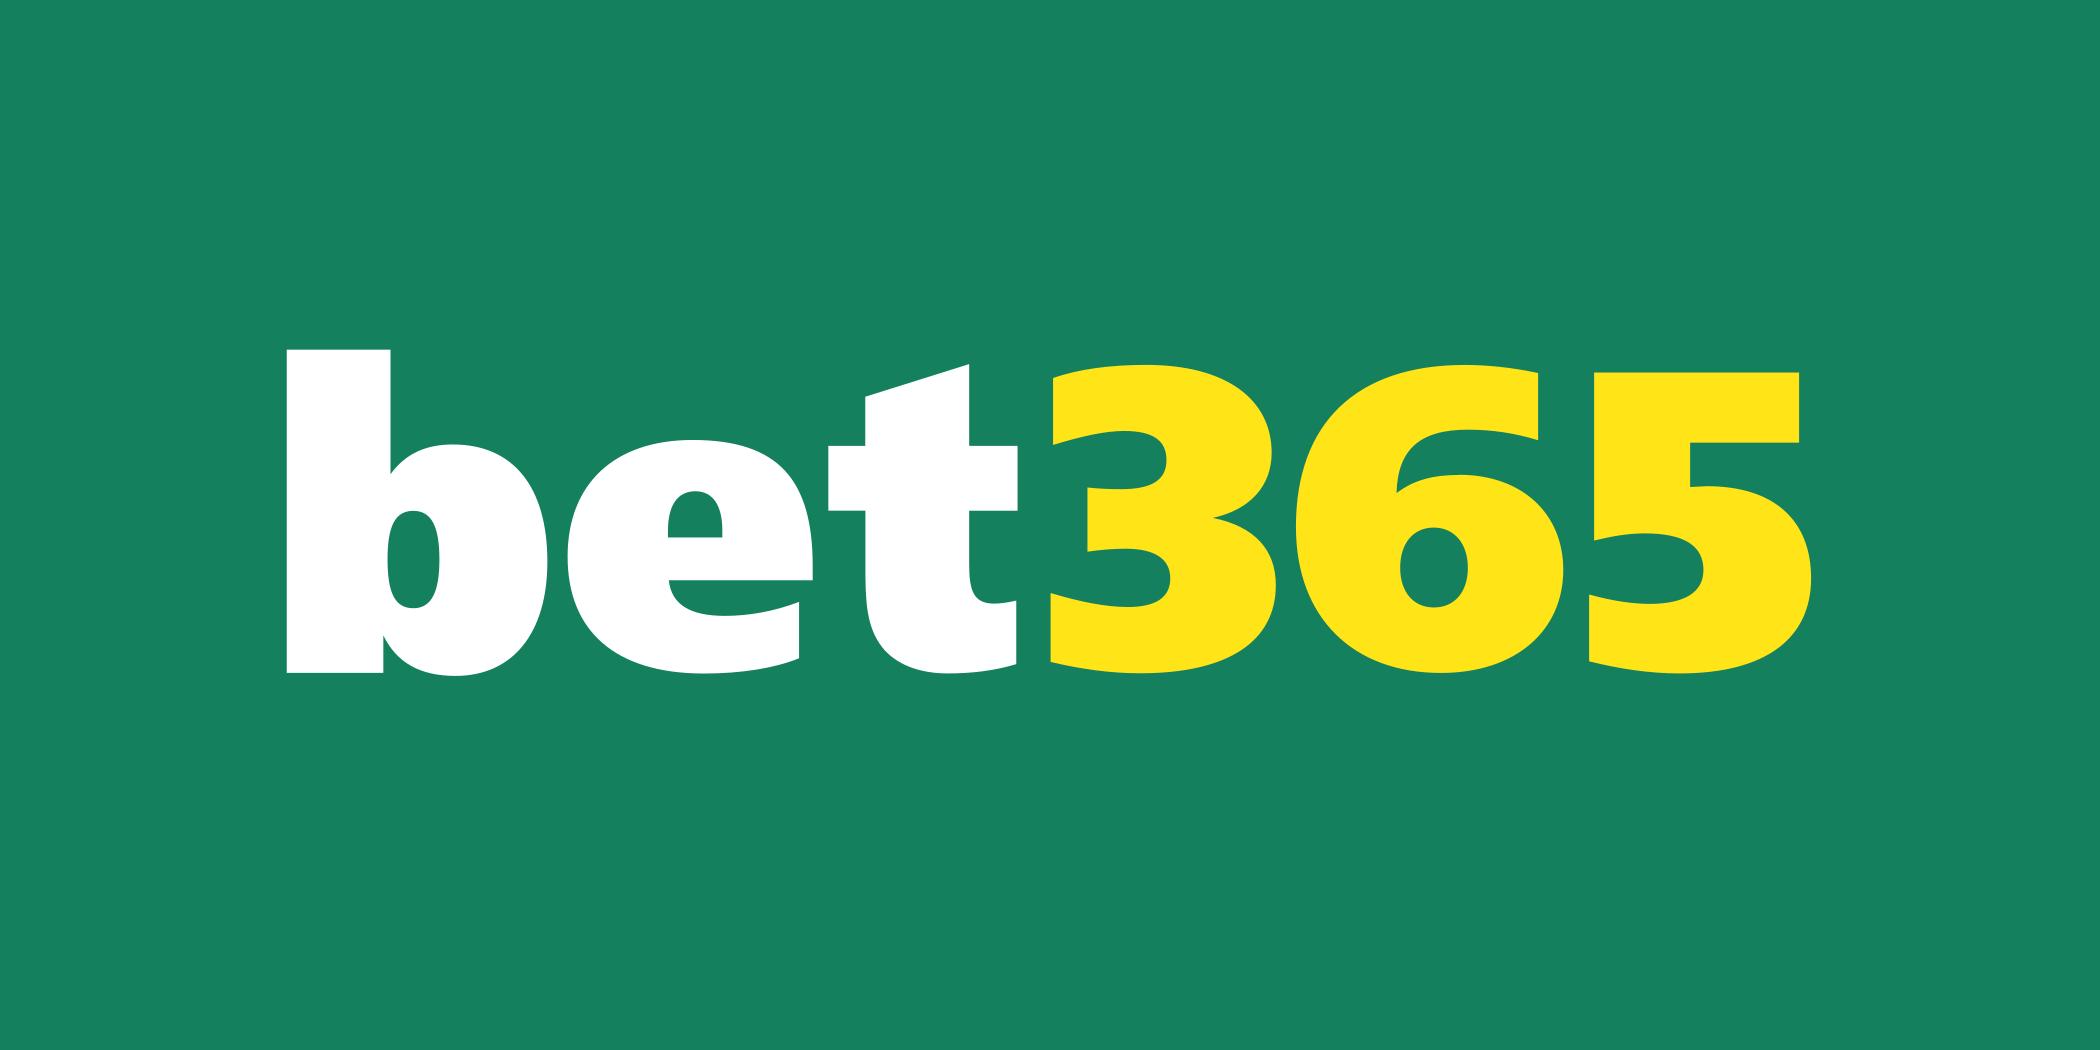 bet365 logo 1 - bet365 Logo